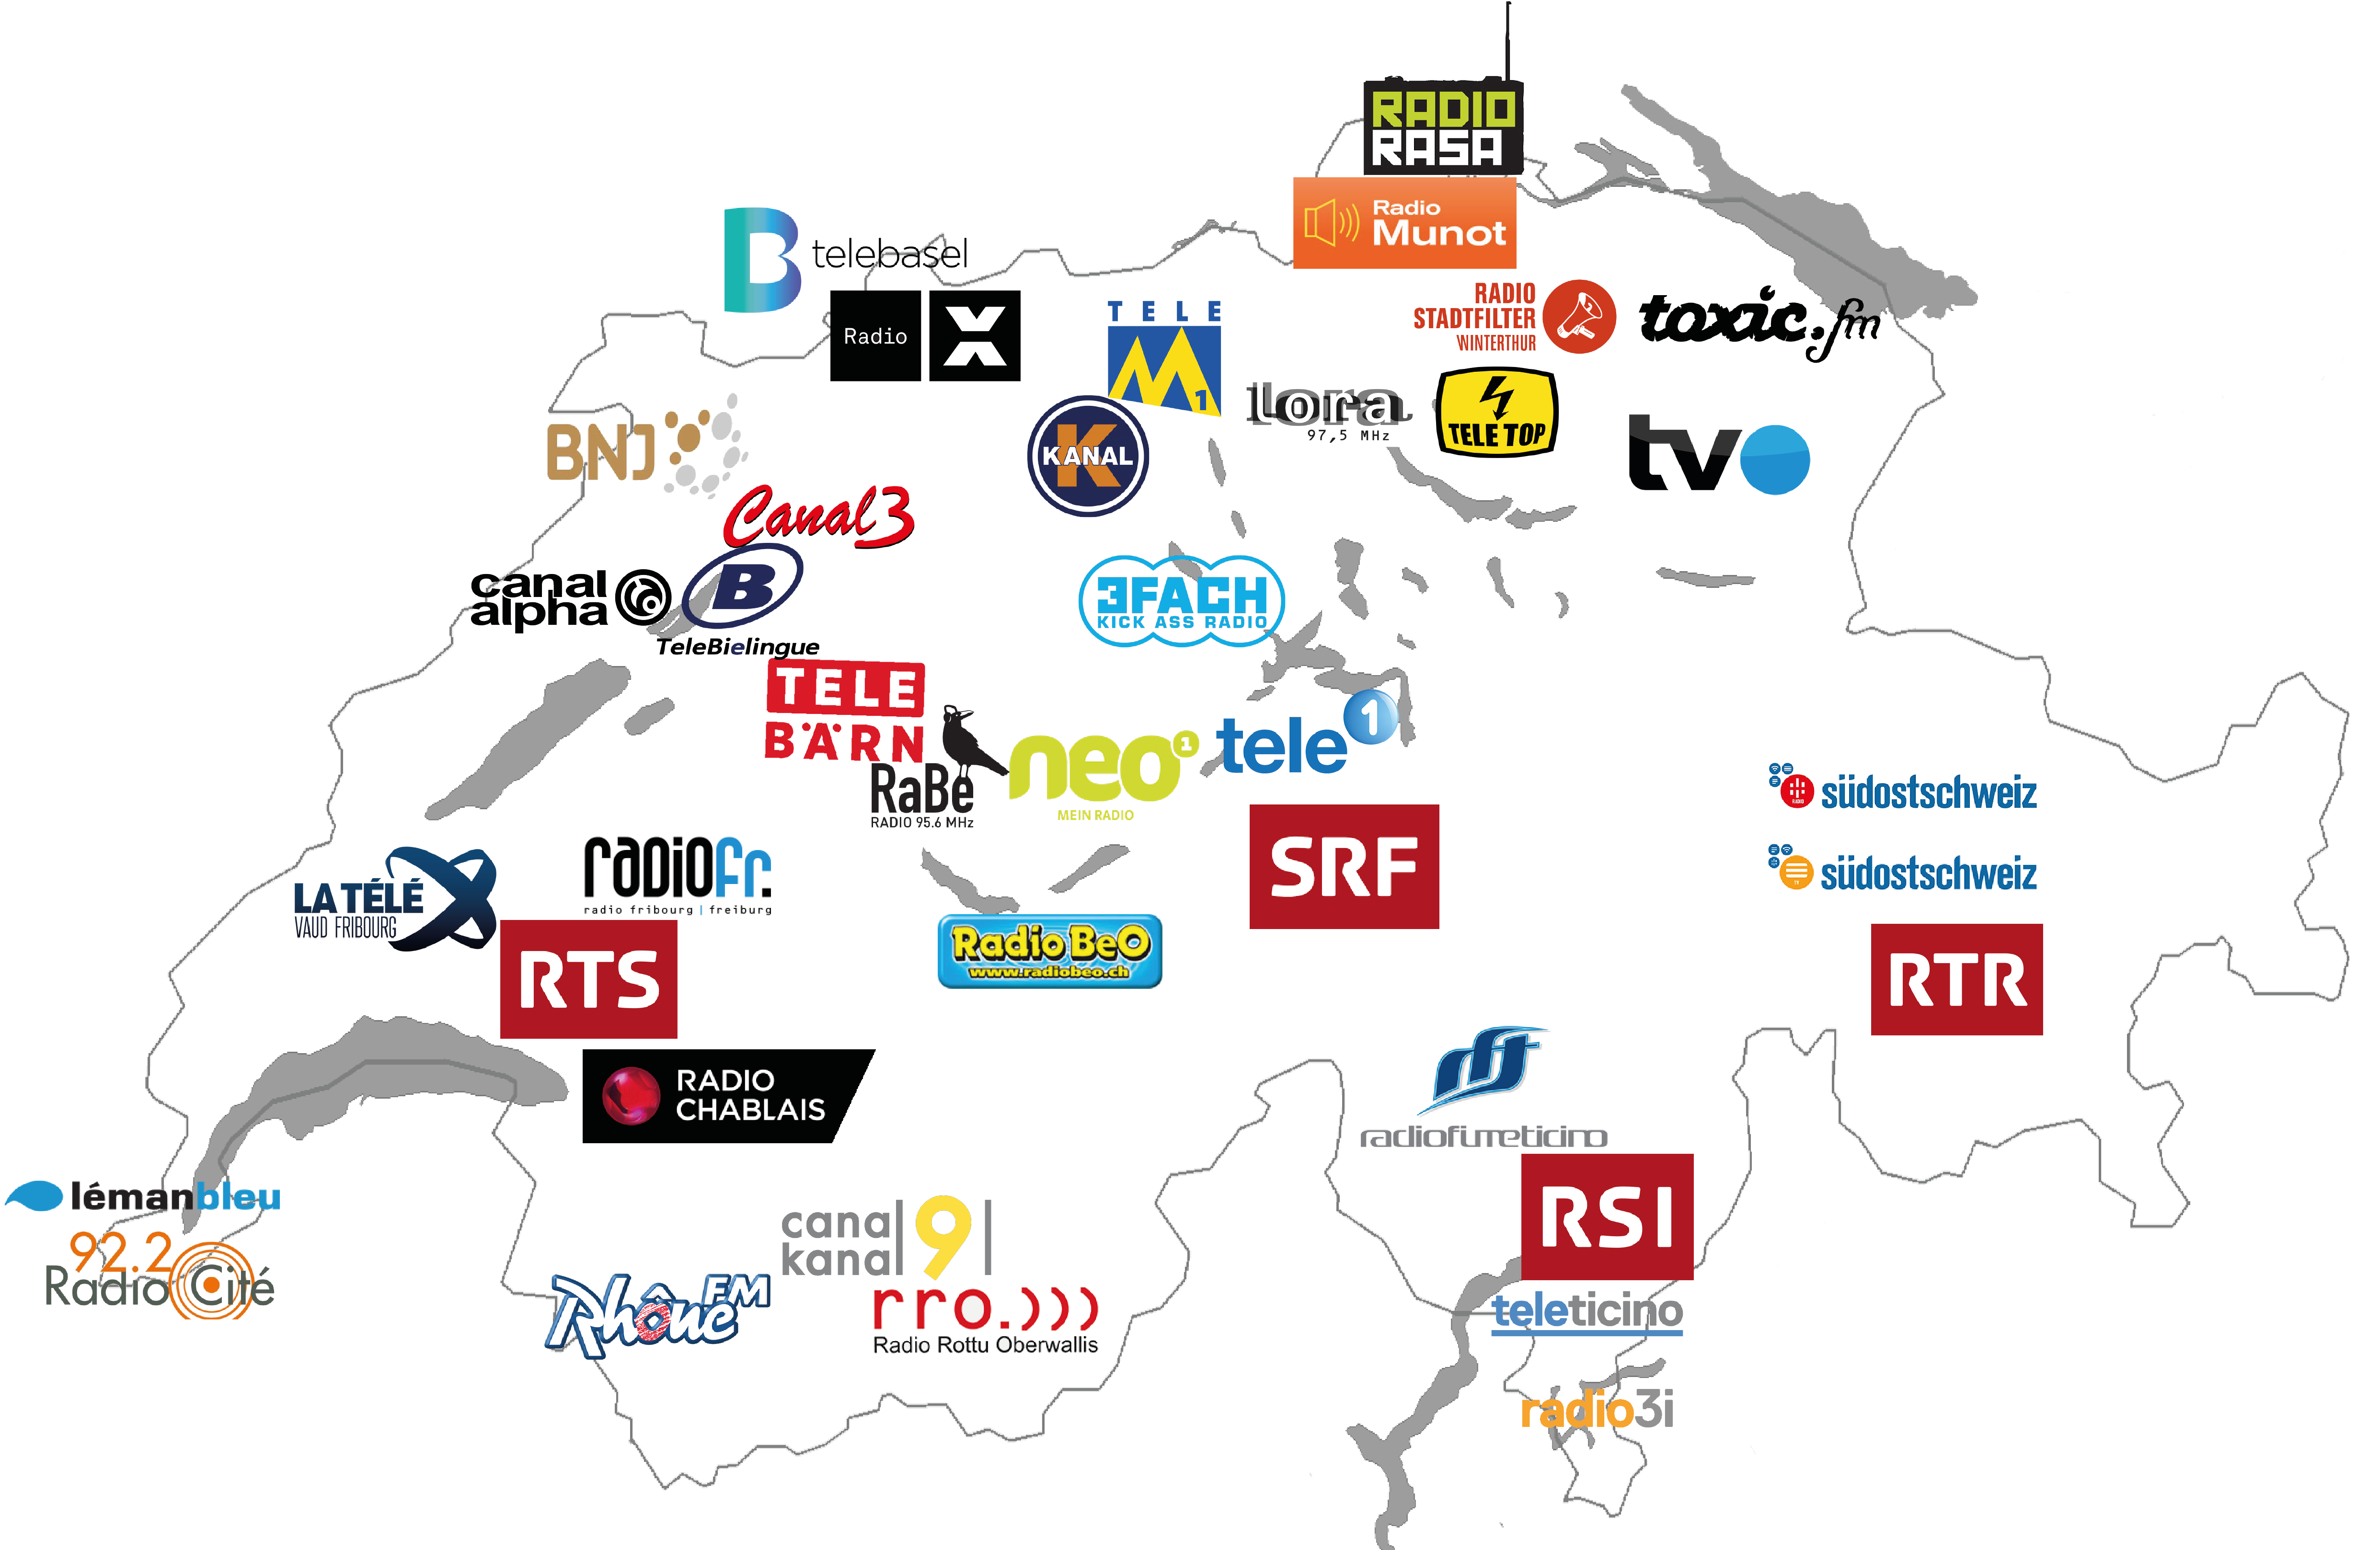 https://www.bakom.admin.ch/bakom/fr/page-daccueil/l-ofcom/organisation/bases-legales/votations/votation-sur-linitiative-pour-la-suppression-des-redevances-radio-tv/_jcr_content/image.imagespooler.png/1517565255758/Karte-Radio_Fernseh_mit-srg_start.png